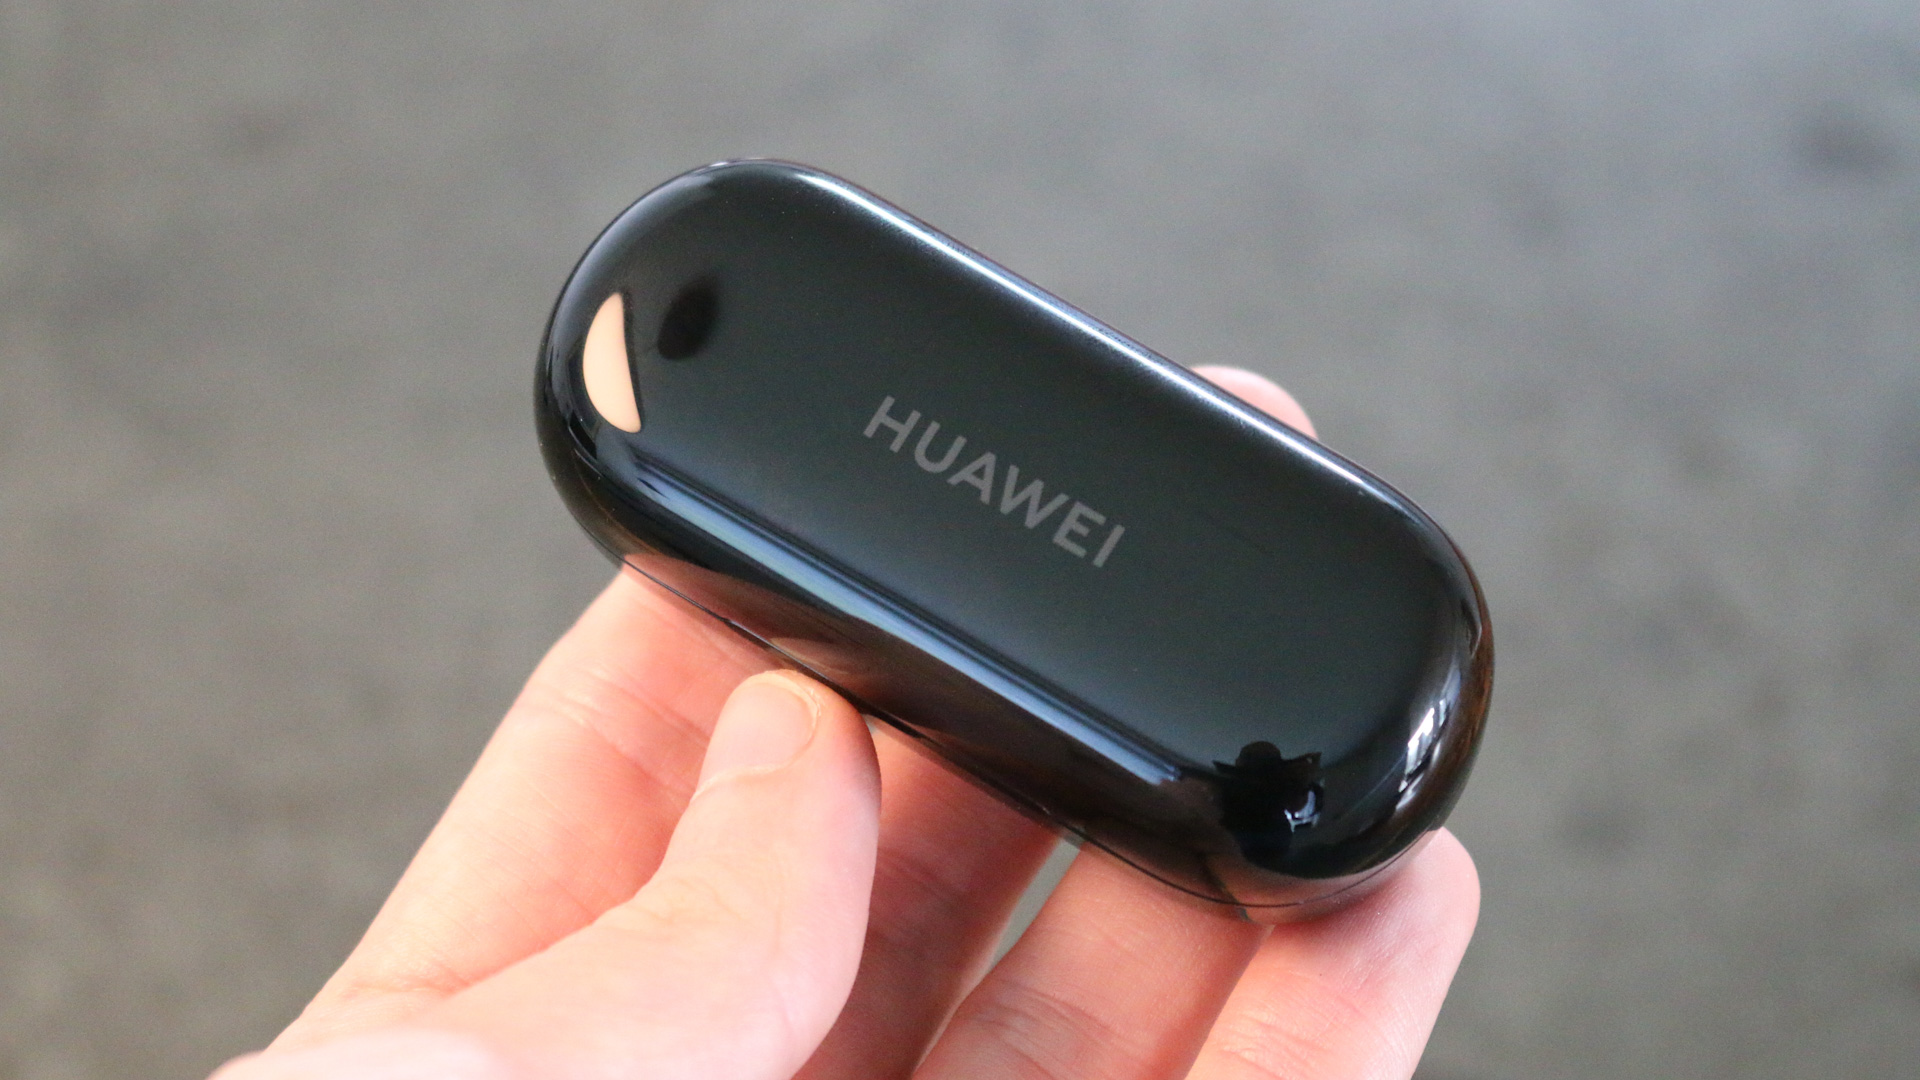 Huawei-FreeBuds-3i-review-1